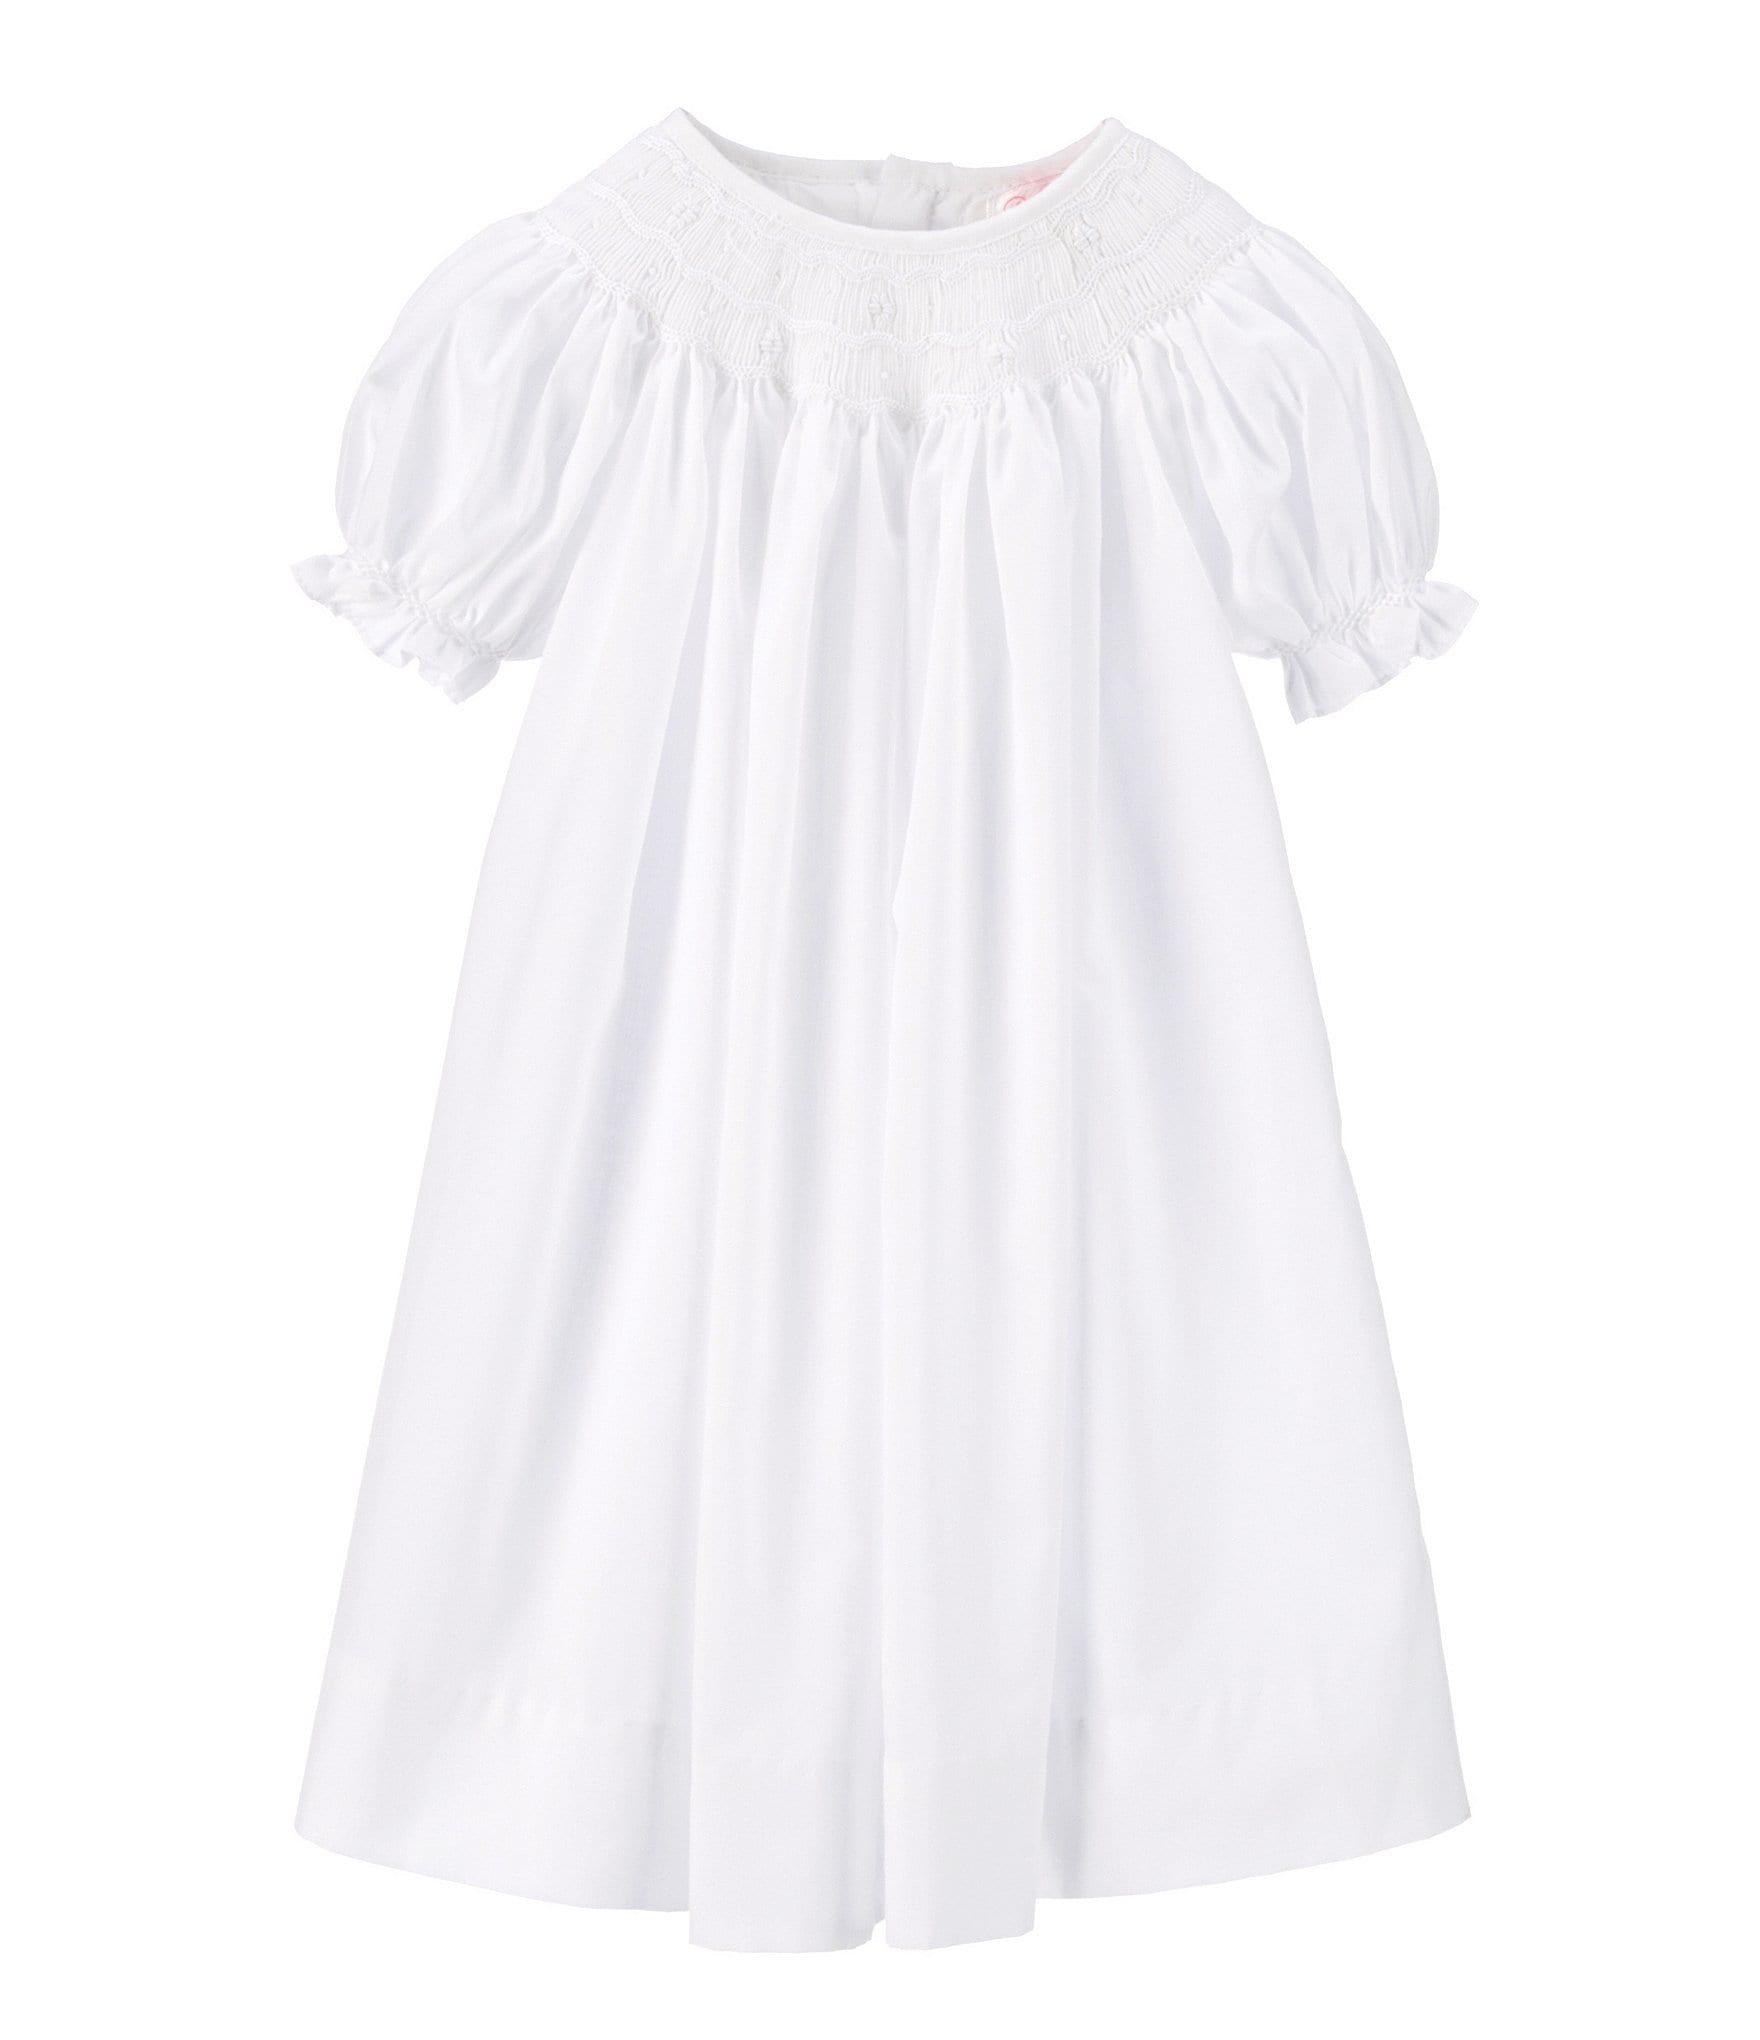 Baby Girl Clothing | Dillards